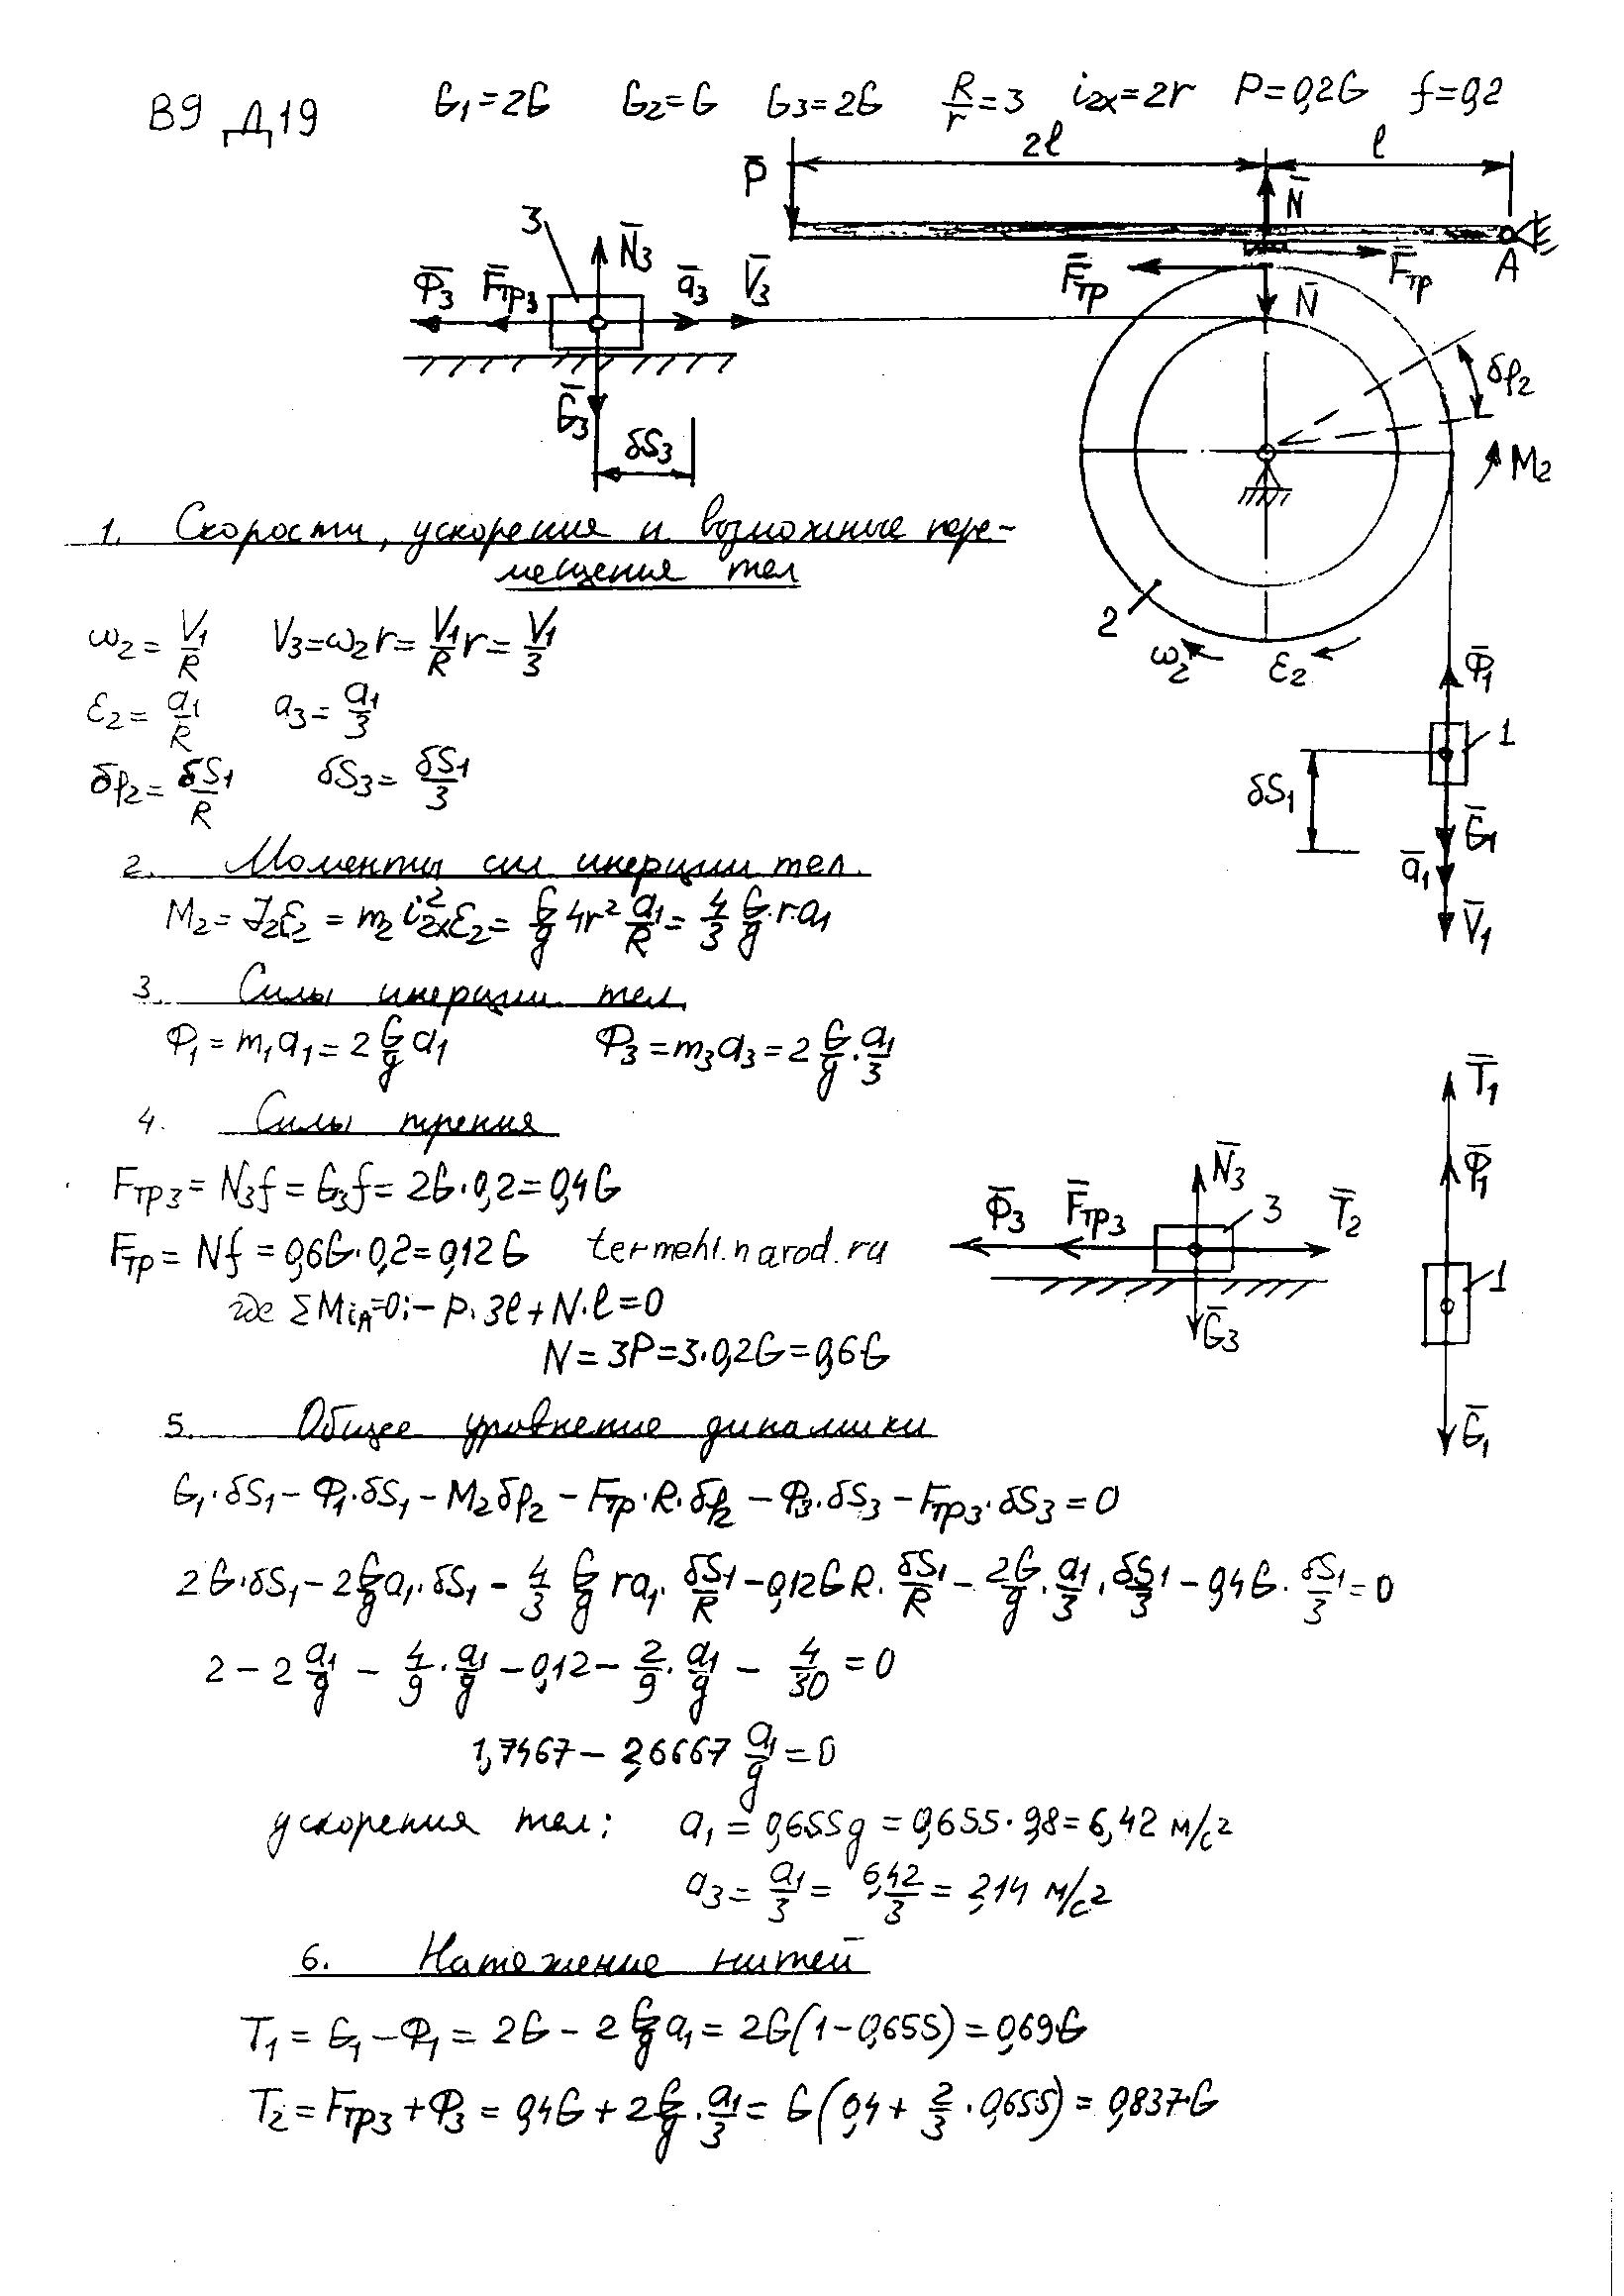 решебник яблонского 1978 года онлайн